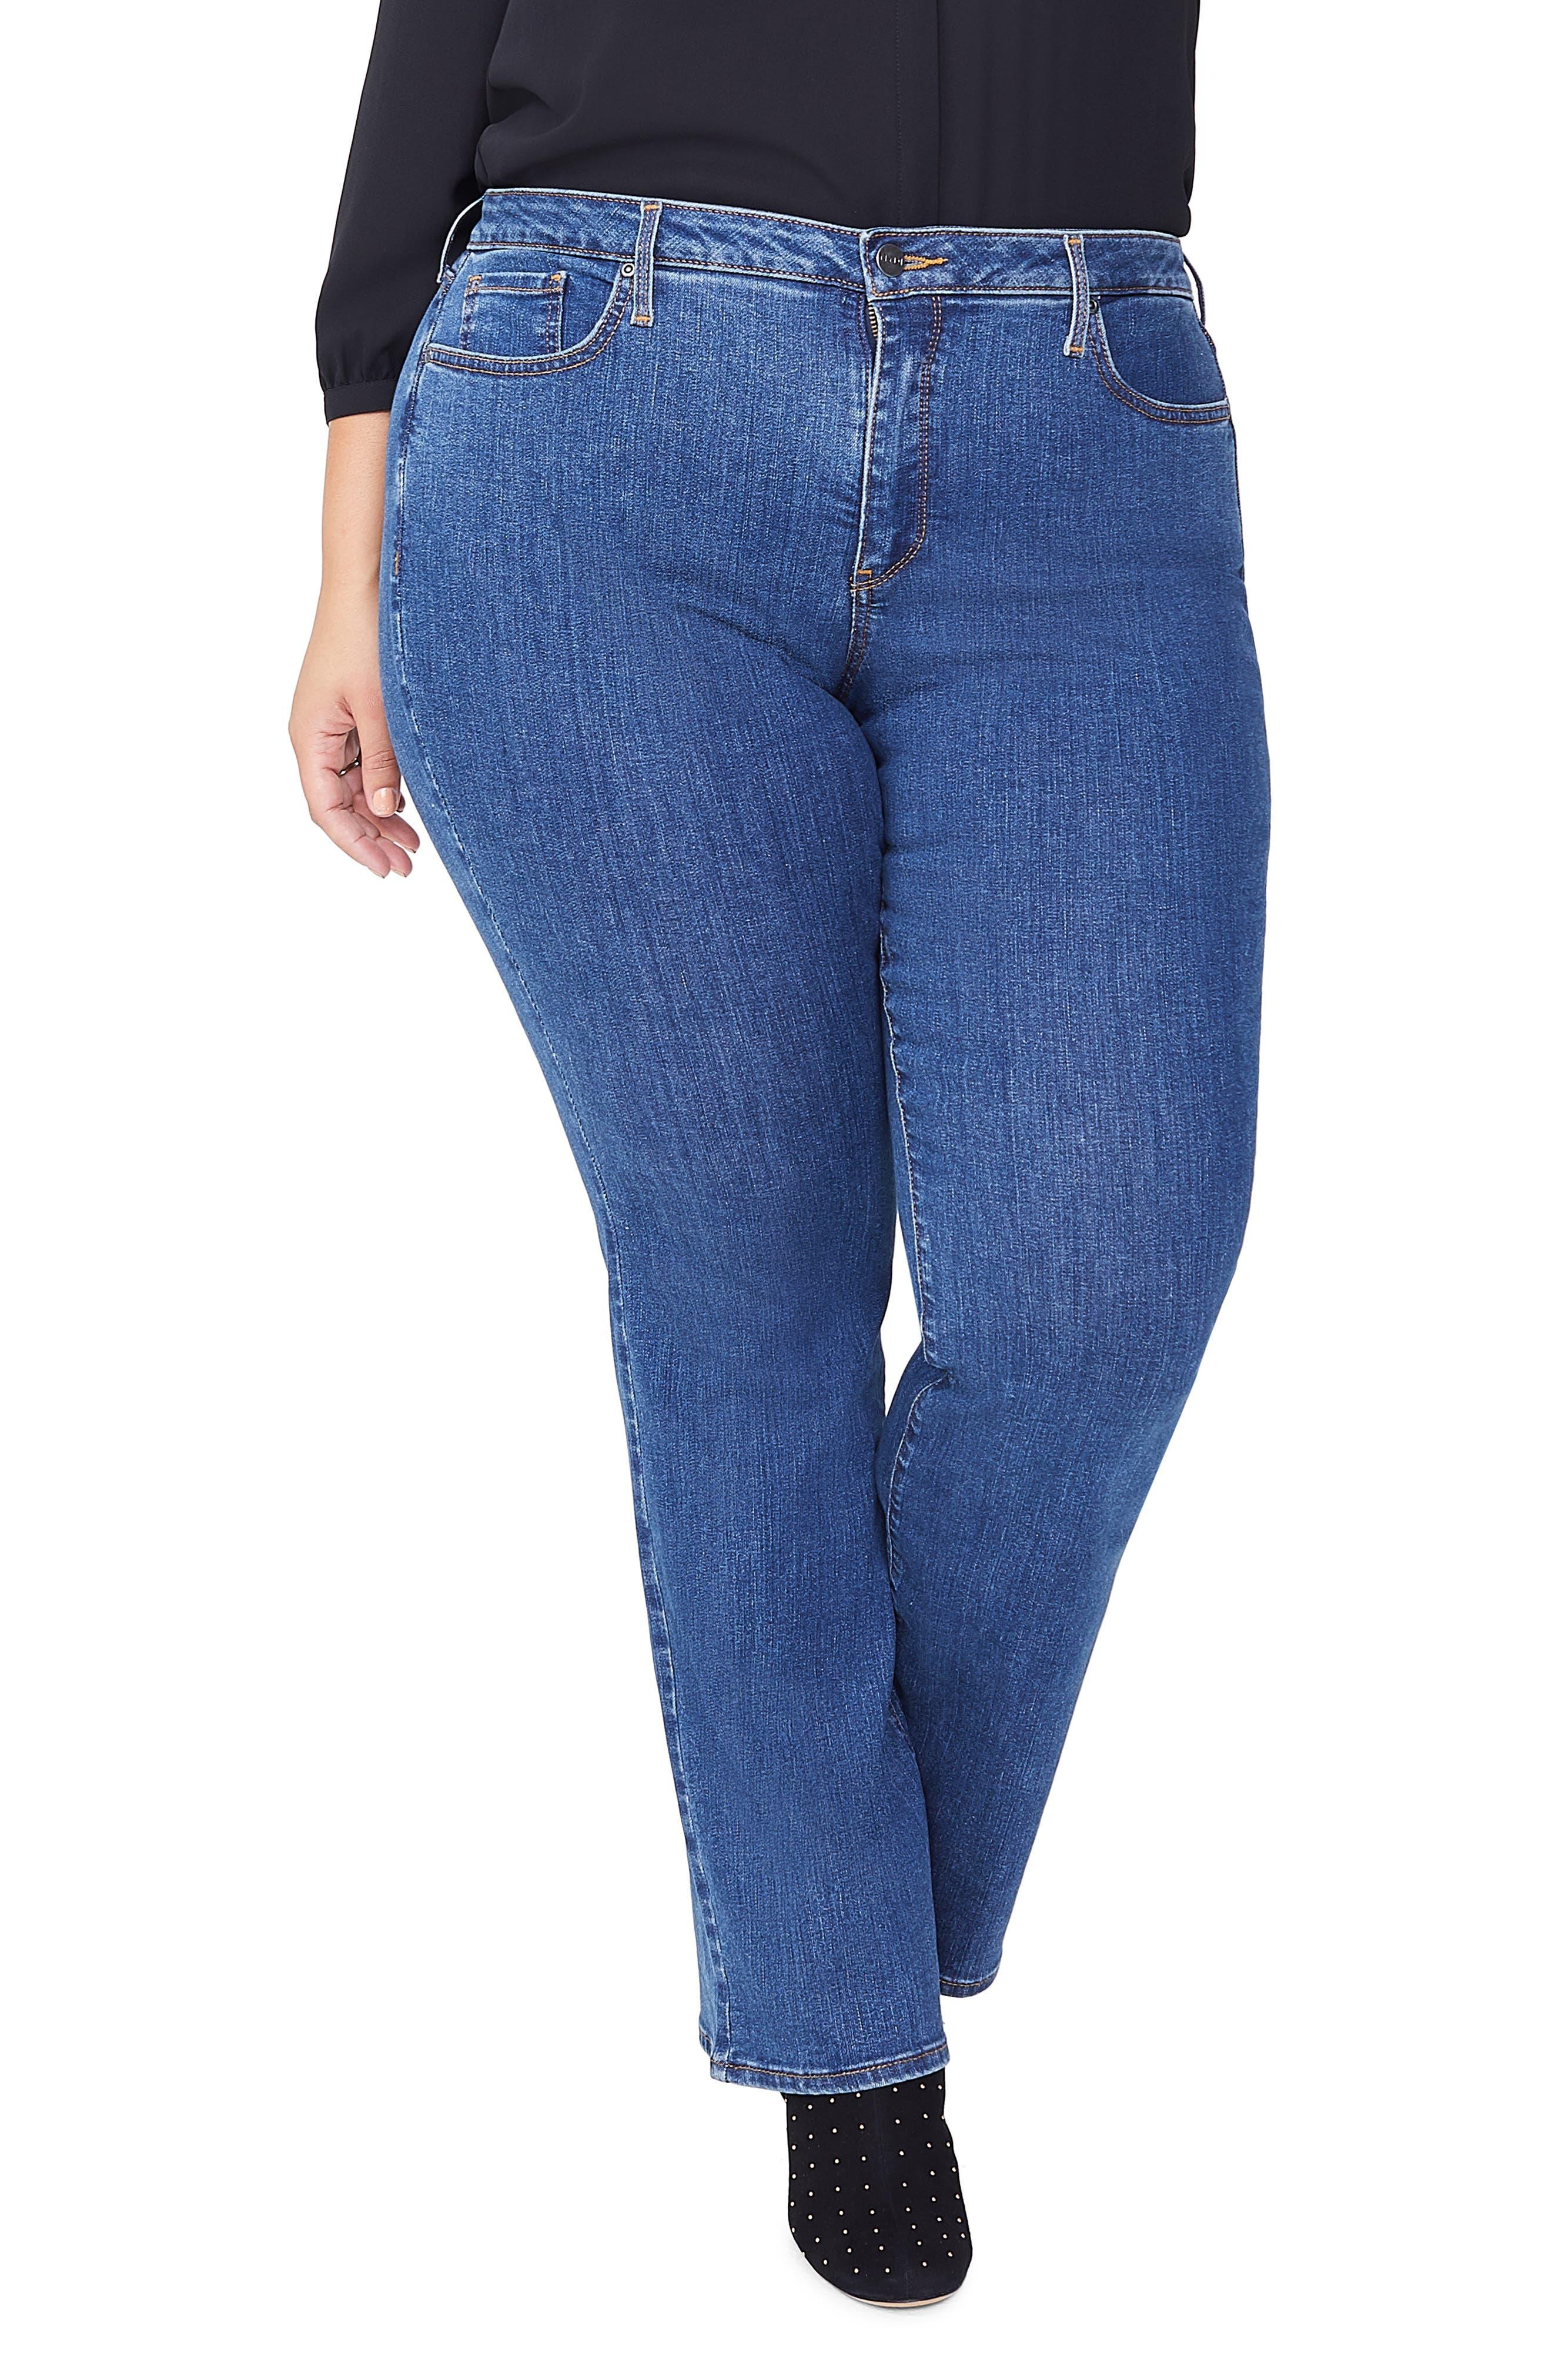 NYDJ Barbara High Waist Bootcut Jeans (Batik Blue) (Plus Size)